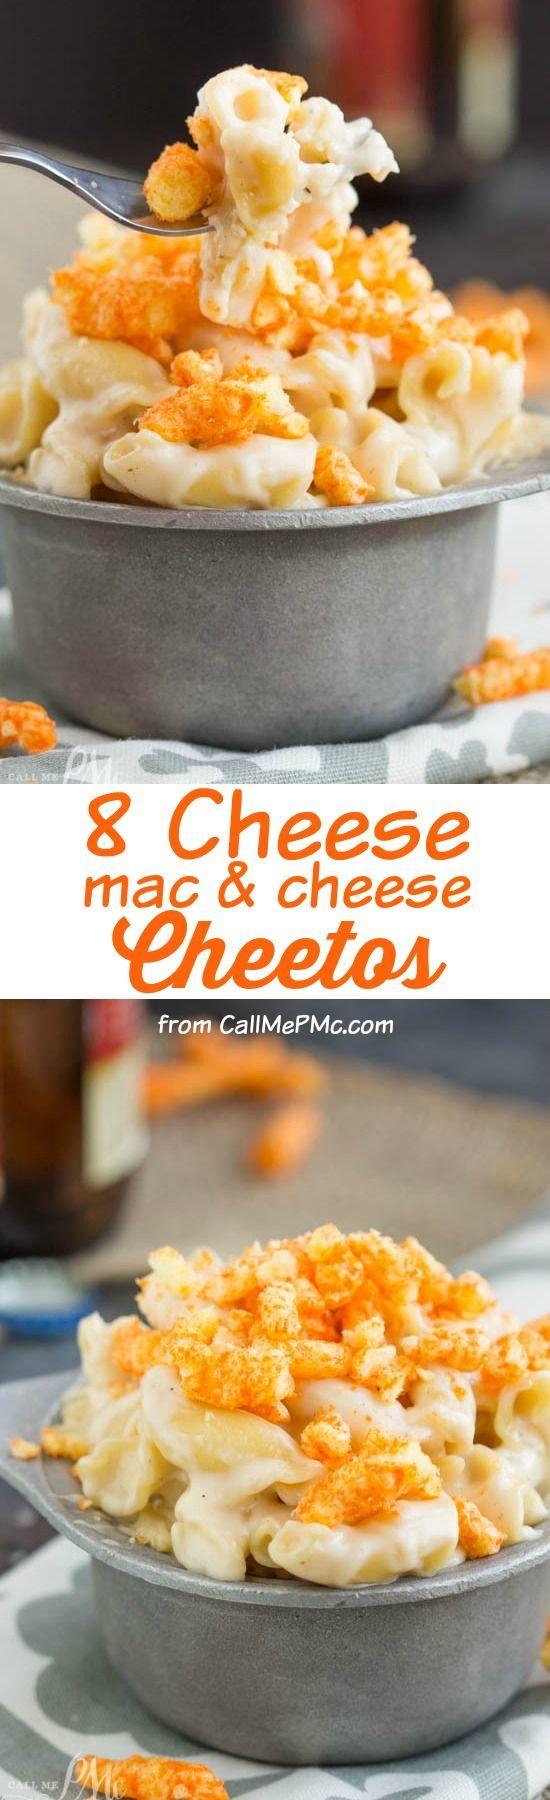 Eight Cheese Mac n Cheese with Cheetos Recipe is cheese on cheese on cheese then topped with crunchy cheesy Cheetos!